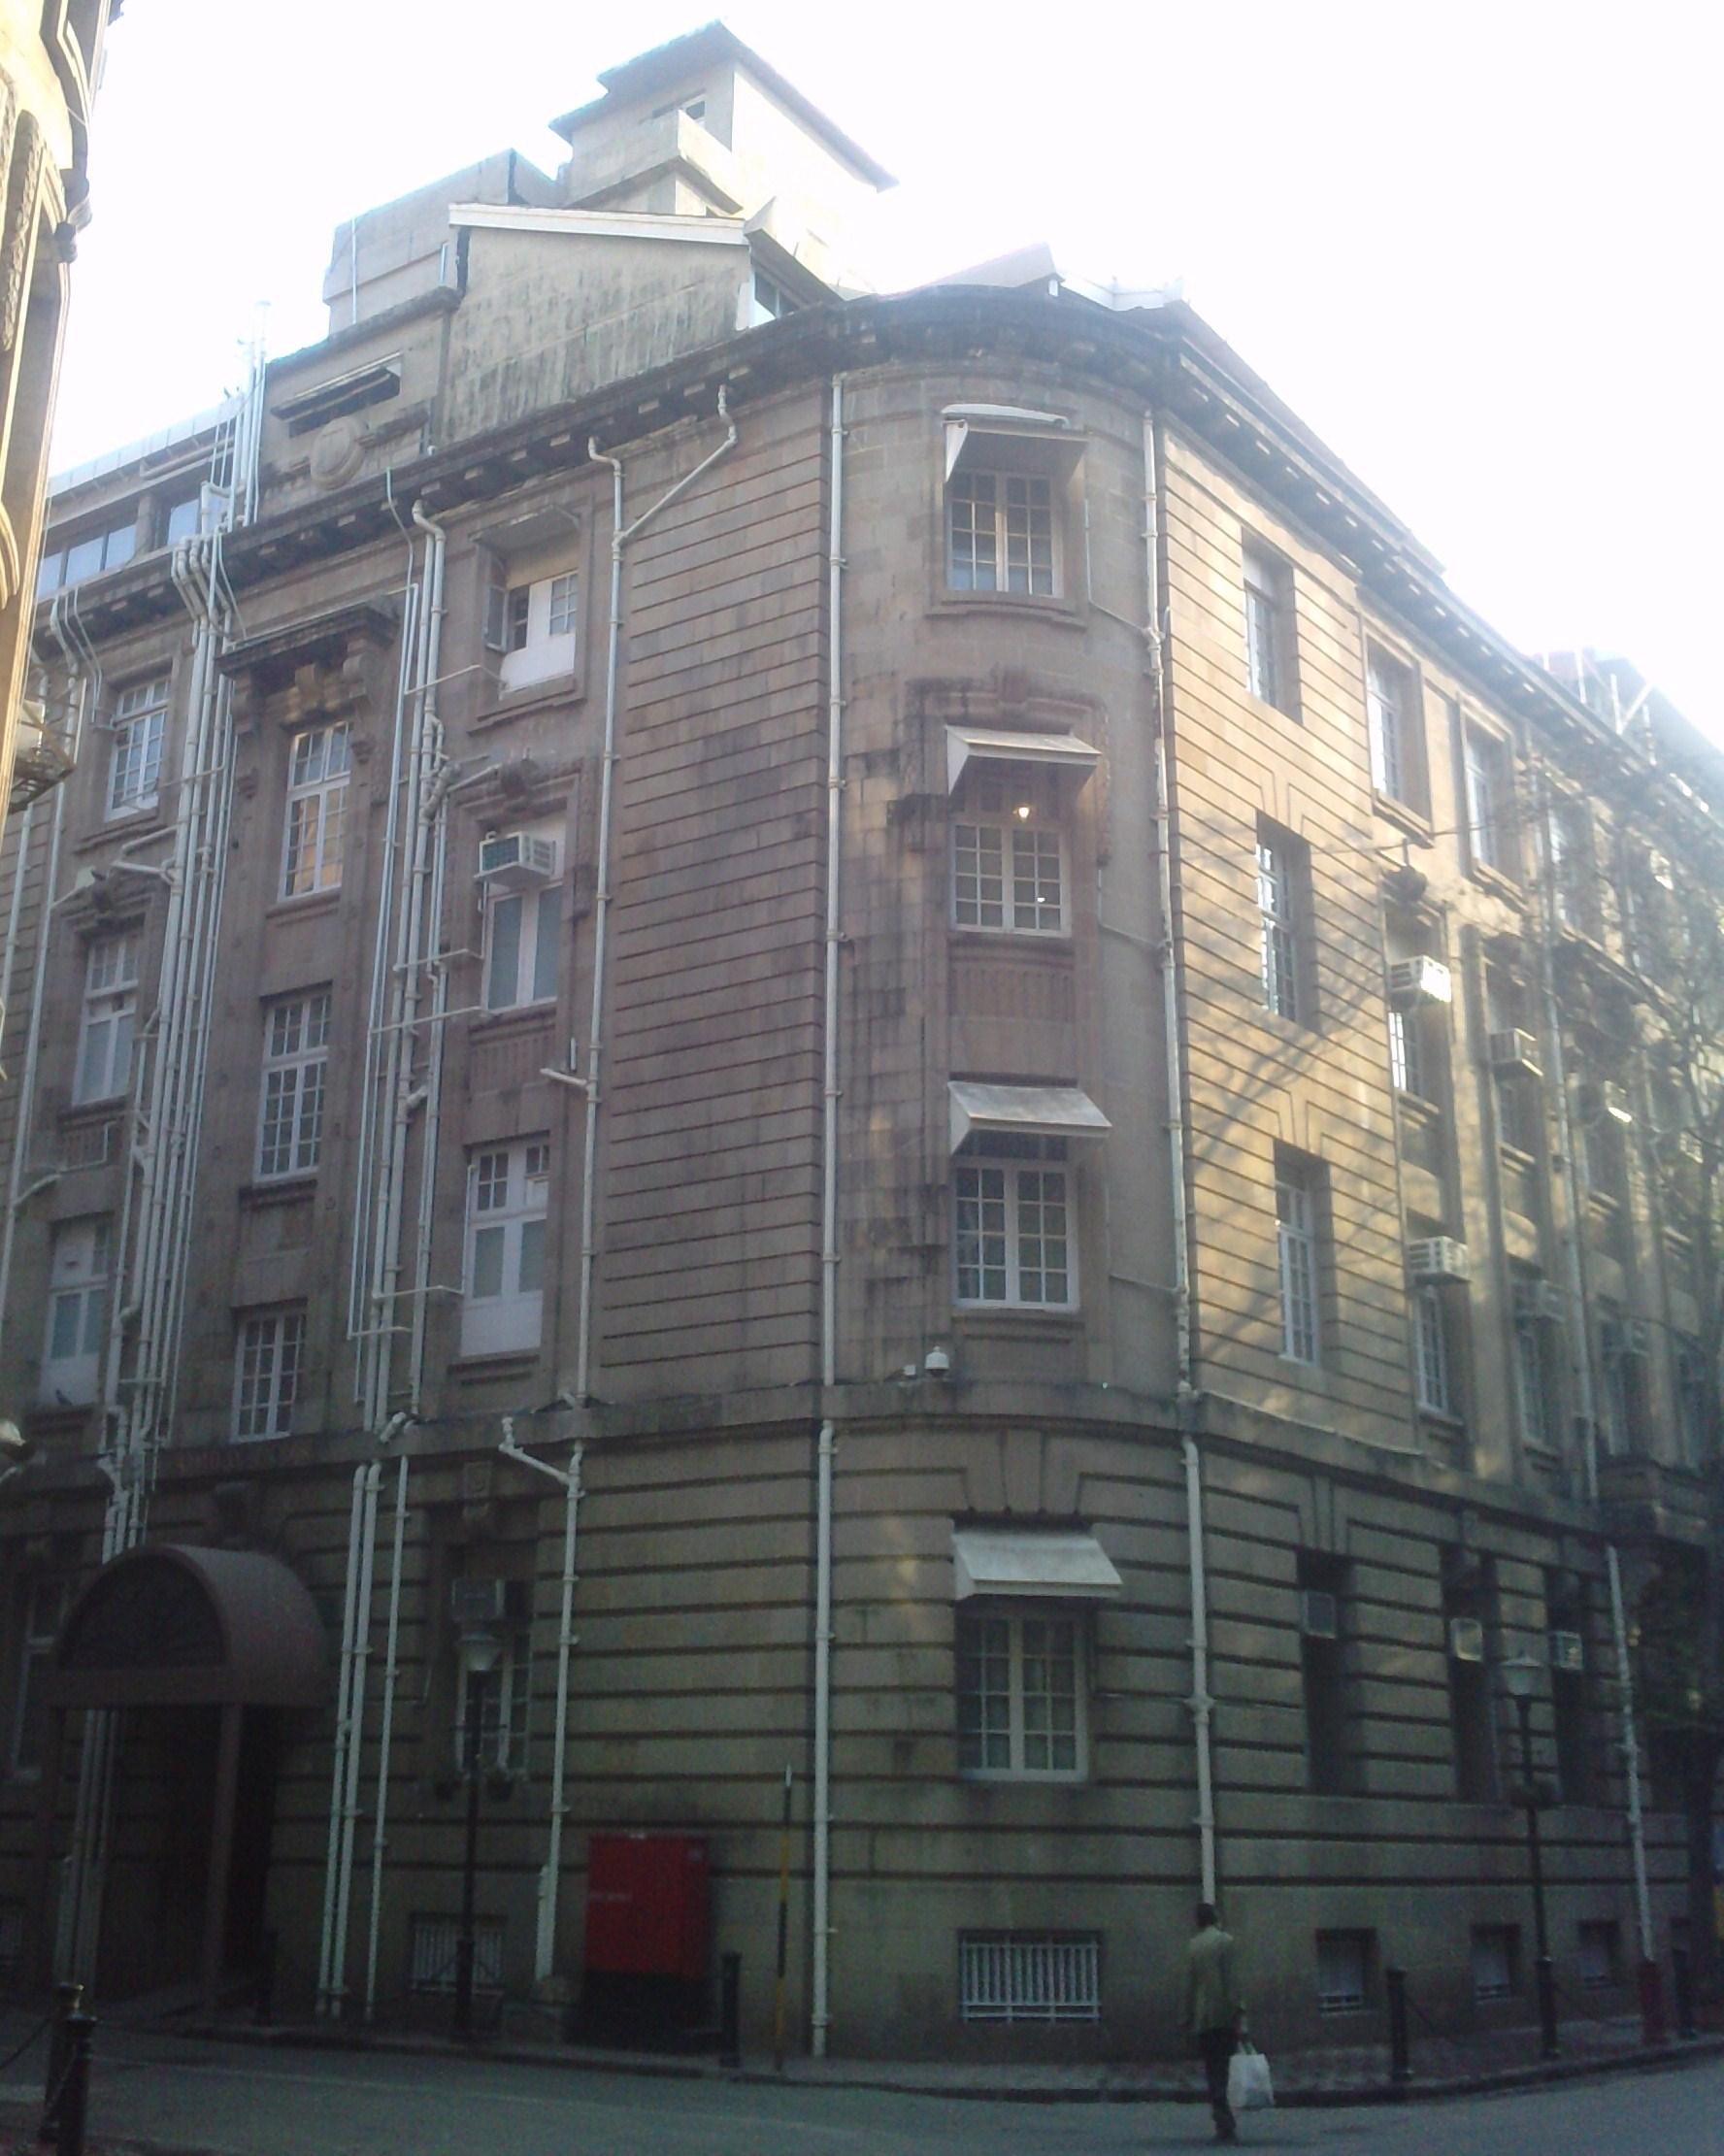 Bombay House - Wikipedia